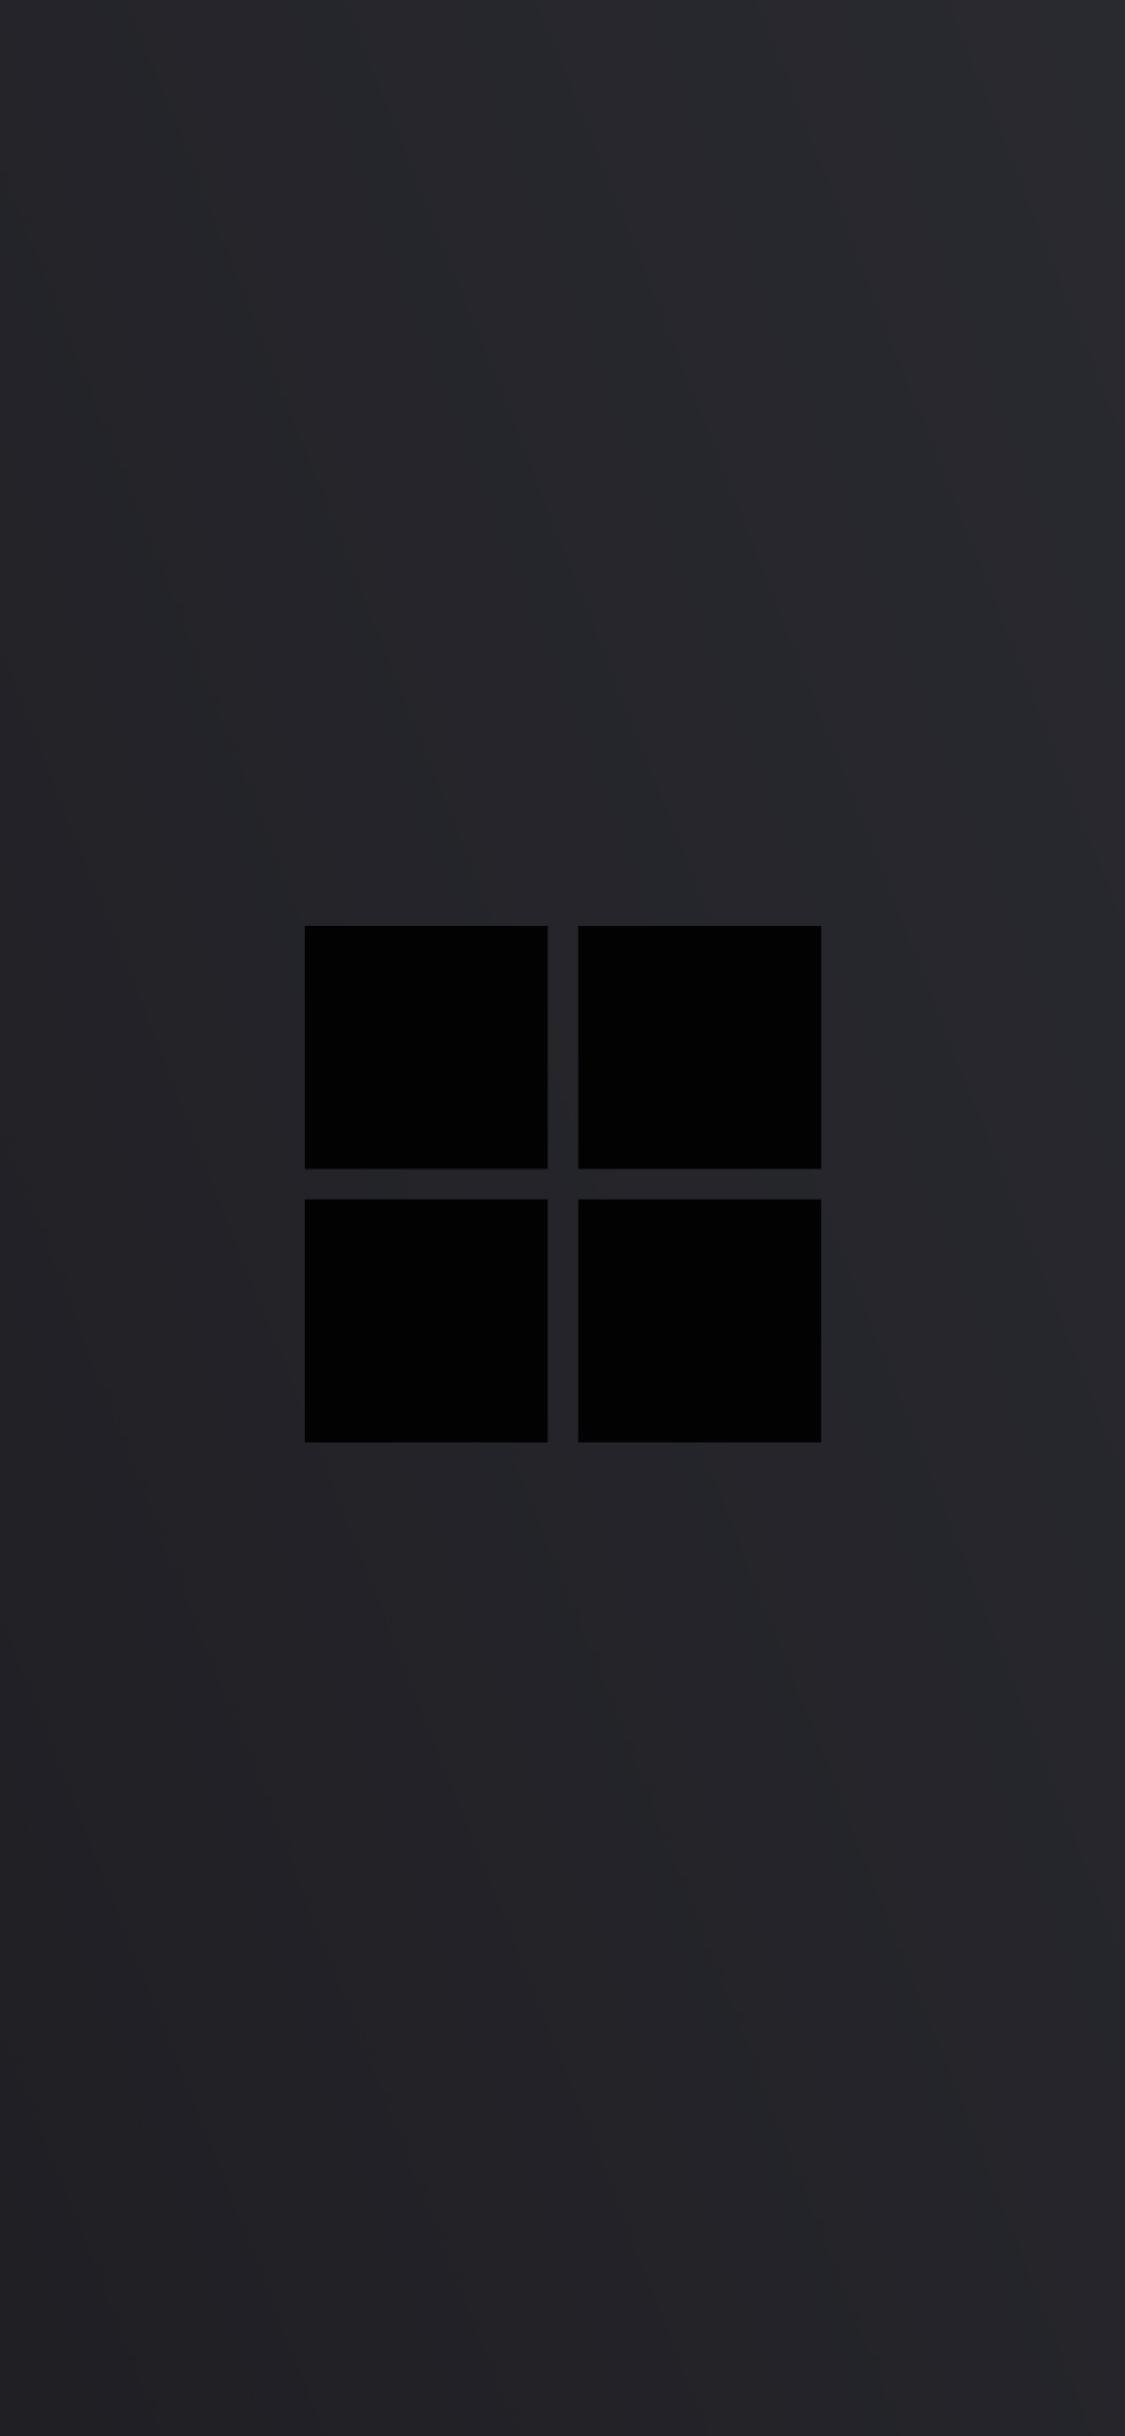 1125x2436 Windows 10 Logo Minimal Dark Iphone XS,Iphone 10 ...